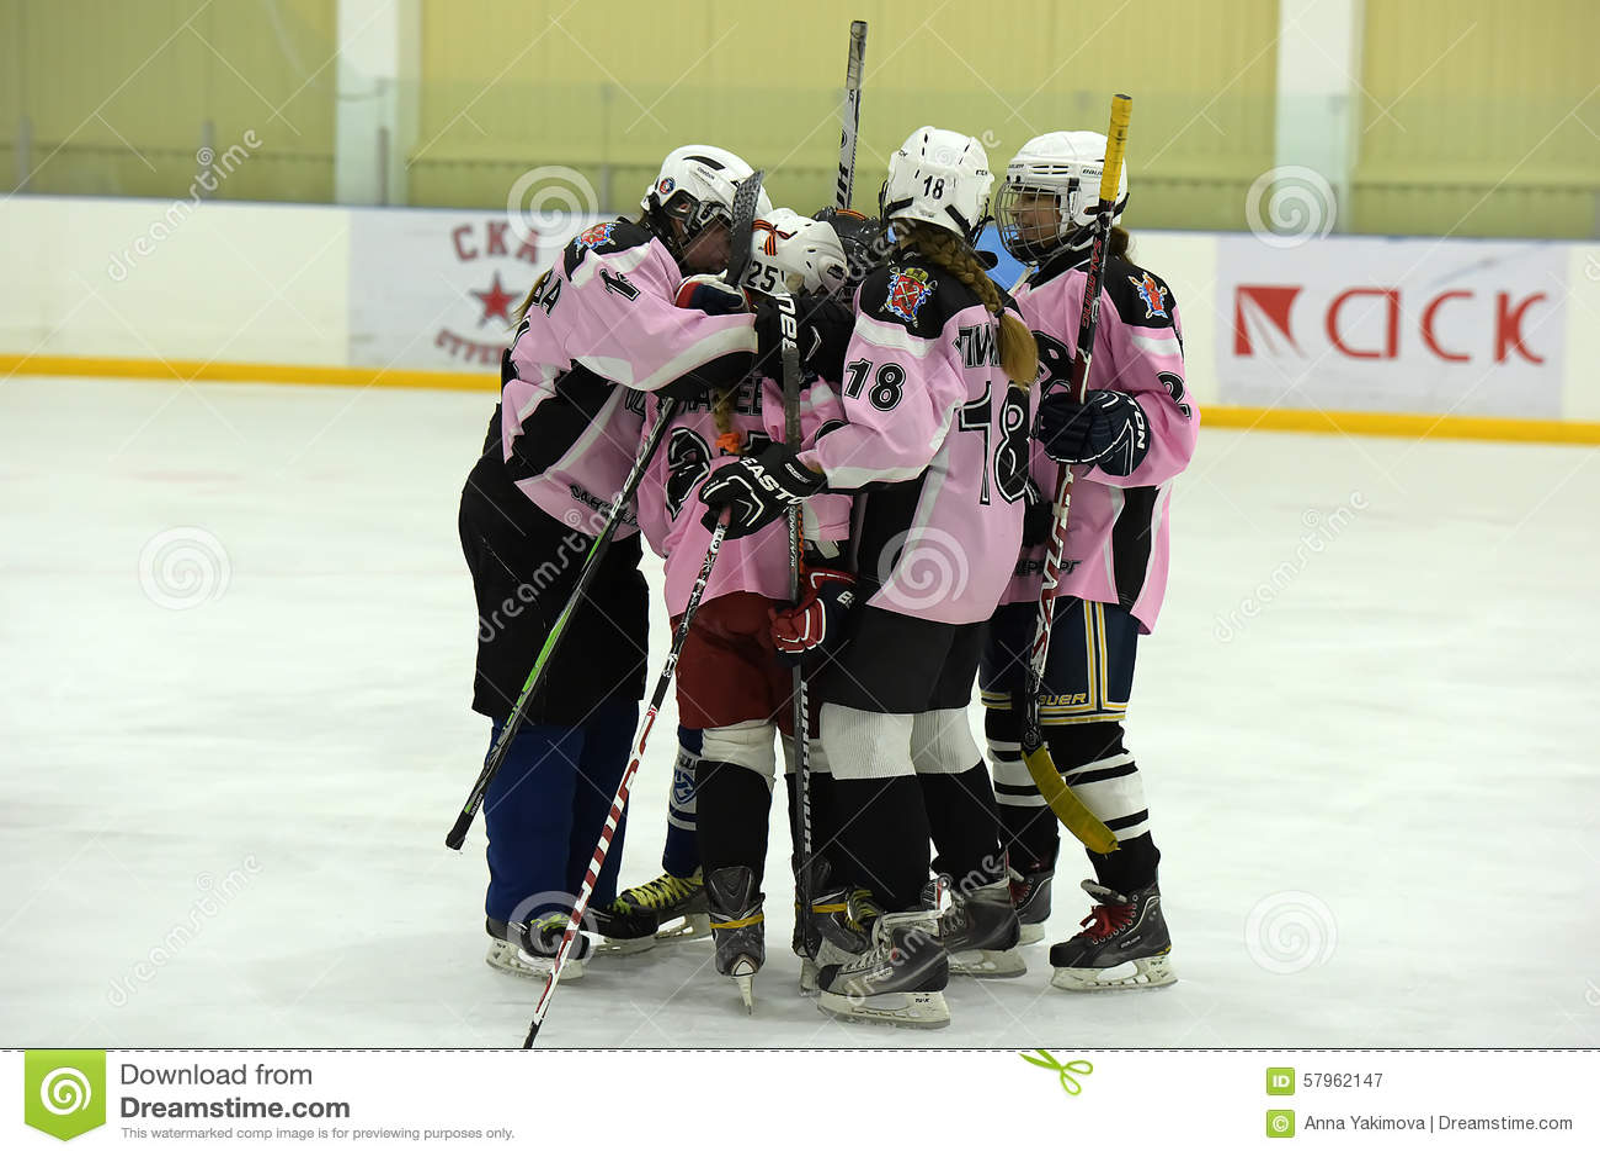 Girls ice hockey match